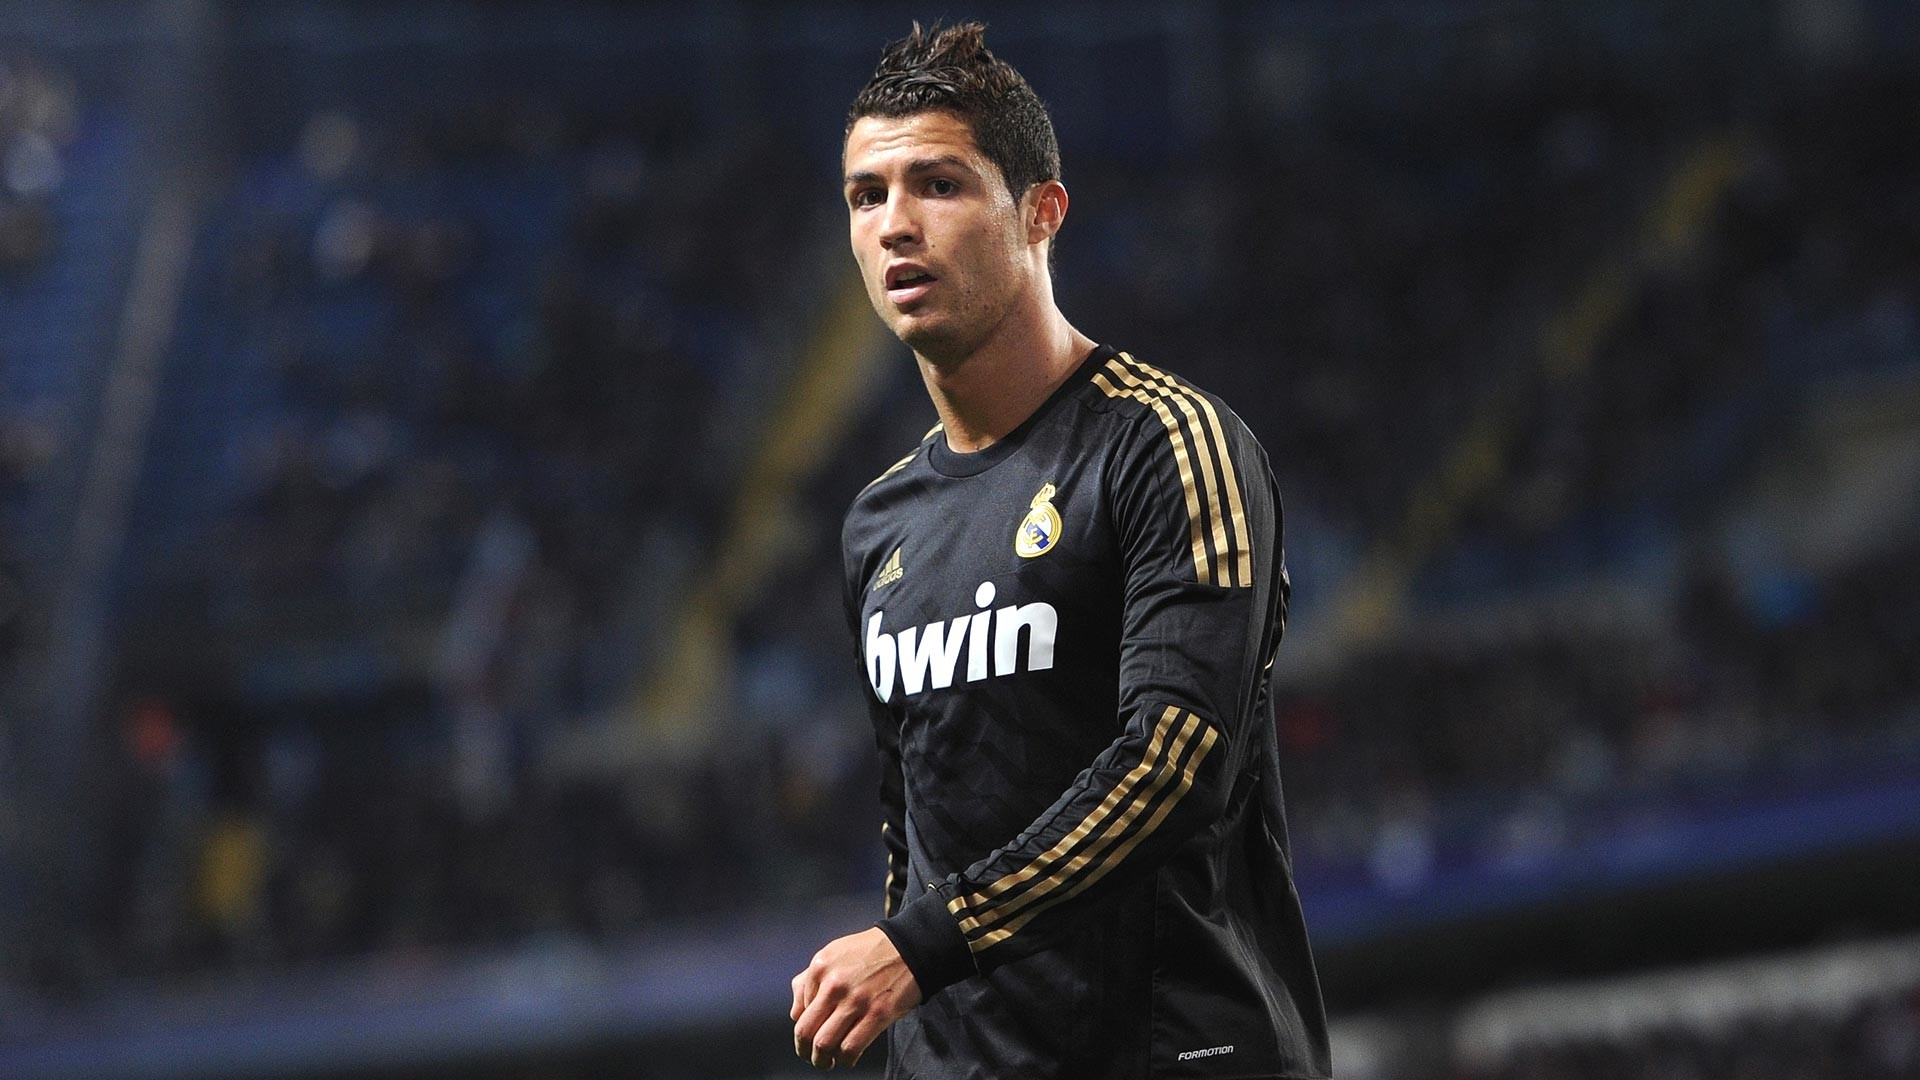 1920x1080 Cristiano Ronaldo Full HD Wallpaper 1920x1080